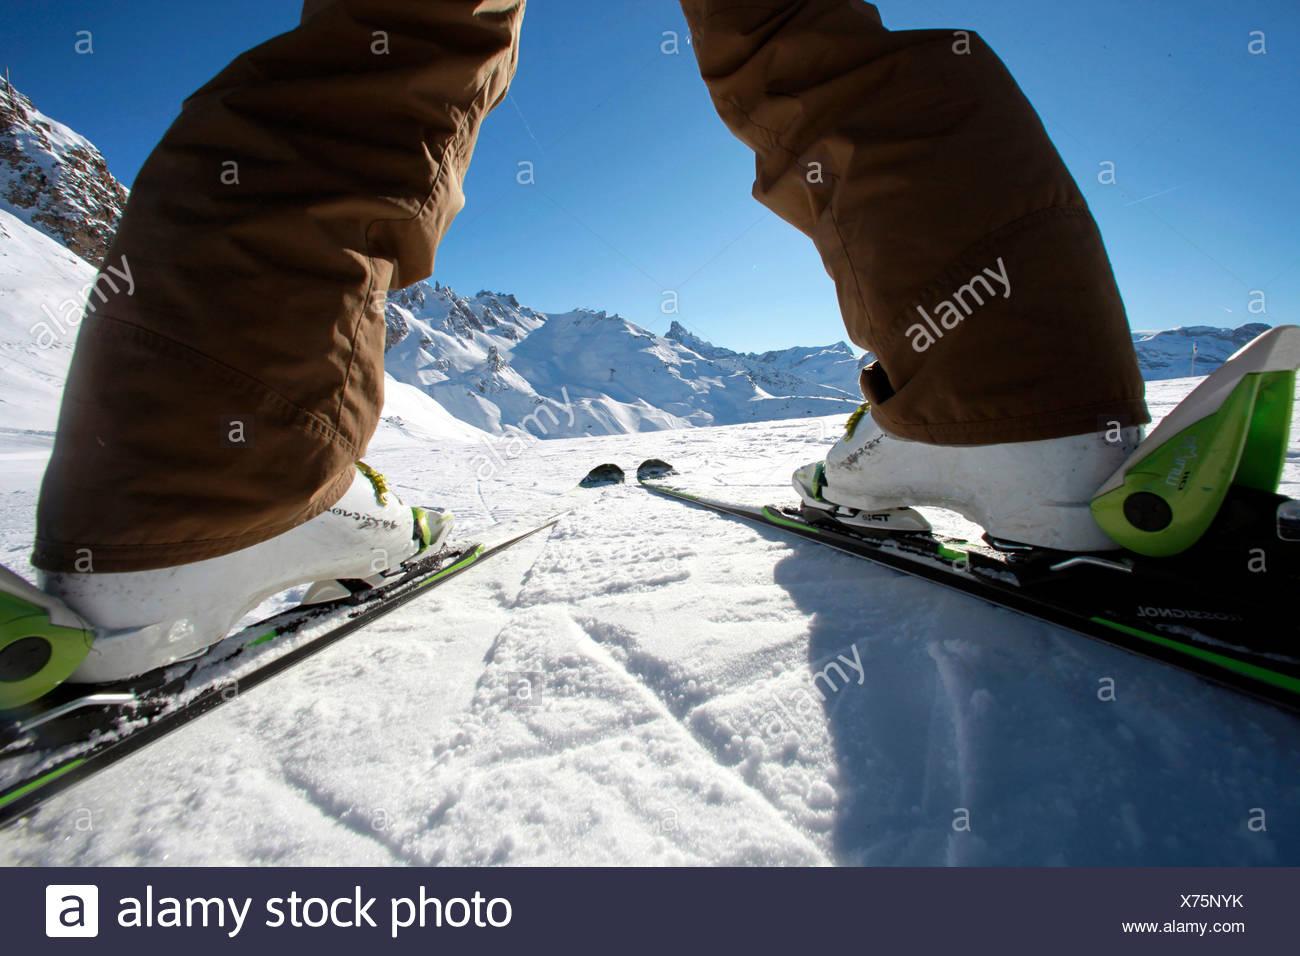 France, Alps, Savoie, Courchevel 1850, female skier Stock Photo